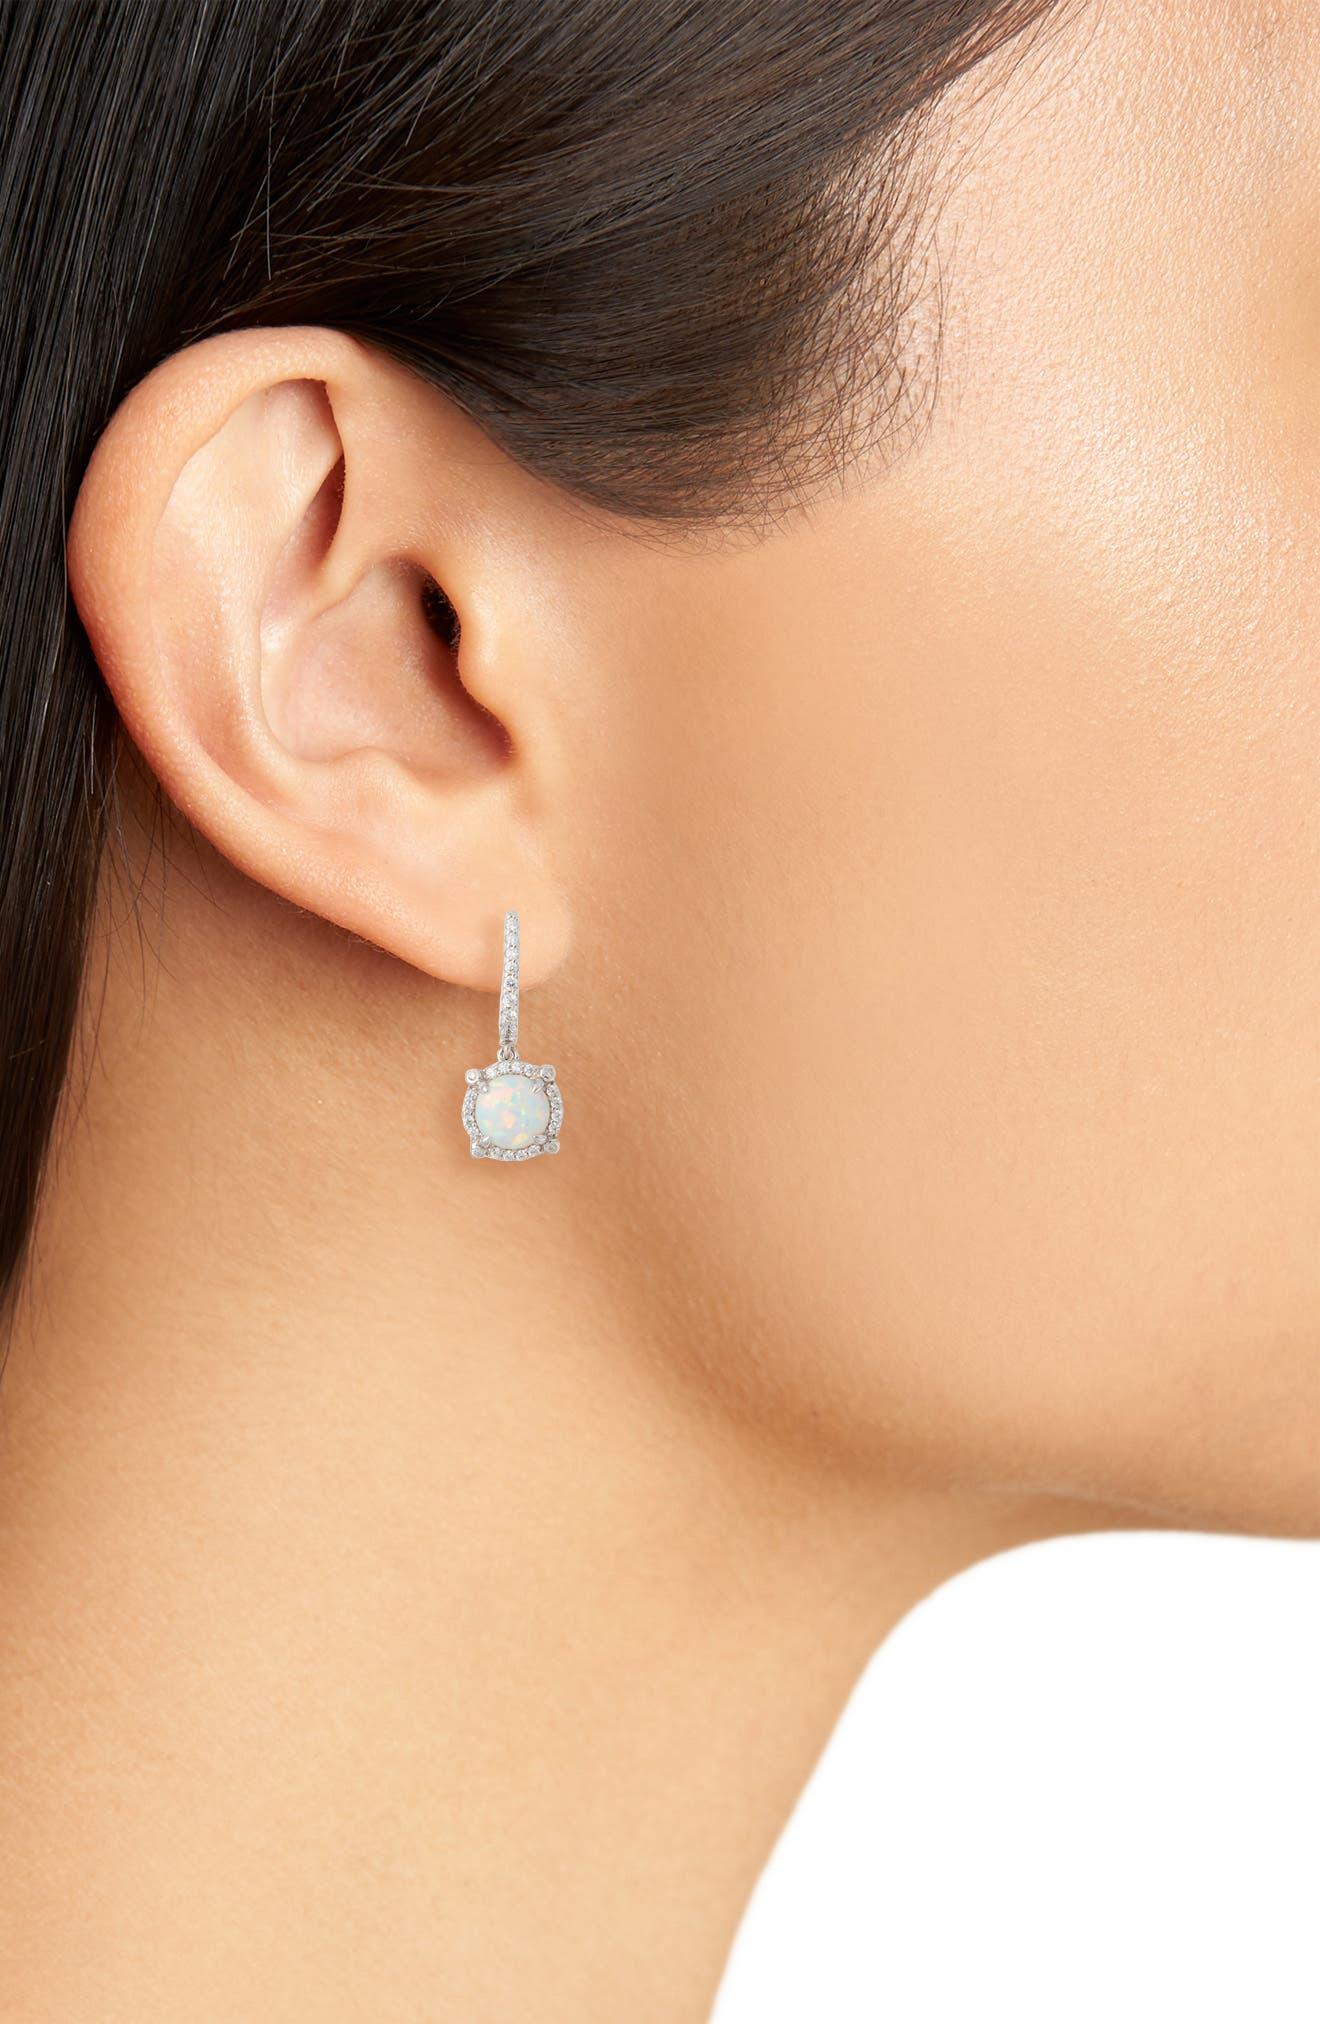 Simulated Diamond Drop Earrings,                             Alternate thumbnail 2, color,                             SILVER/ OPAL/ CLEAR